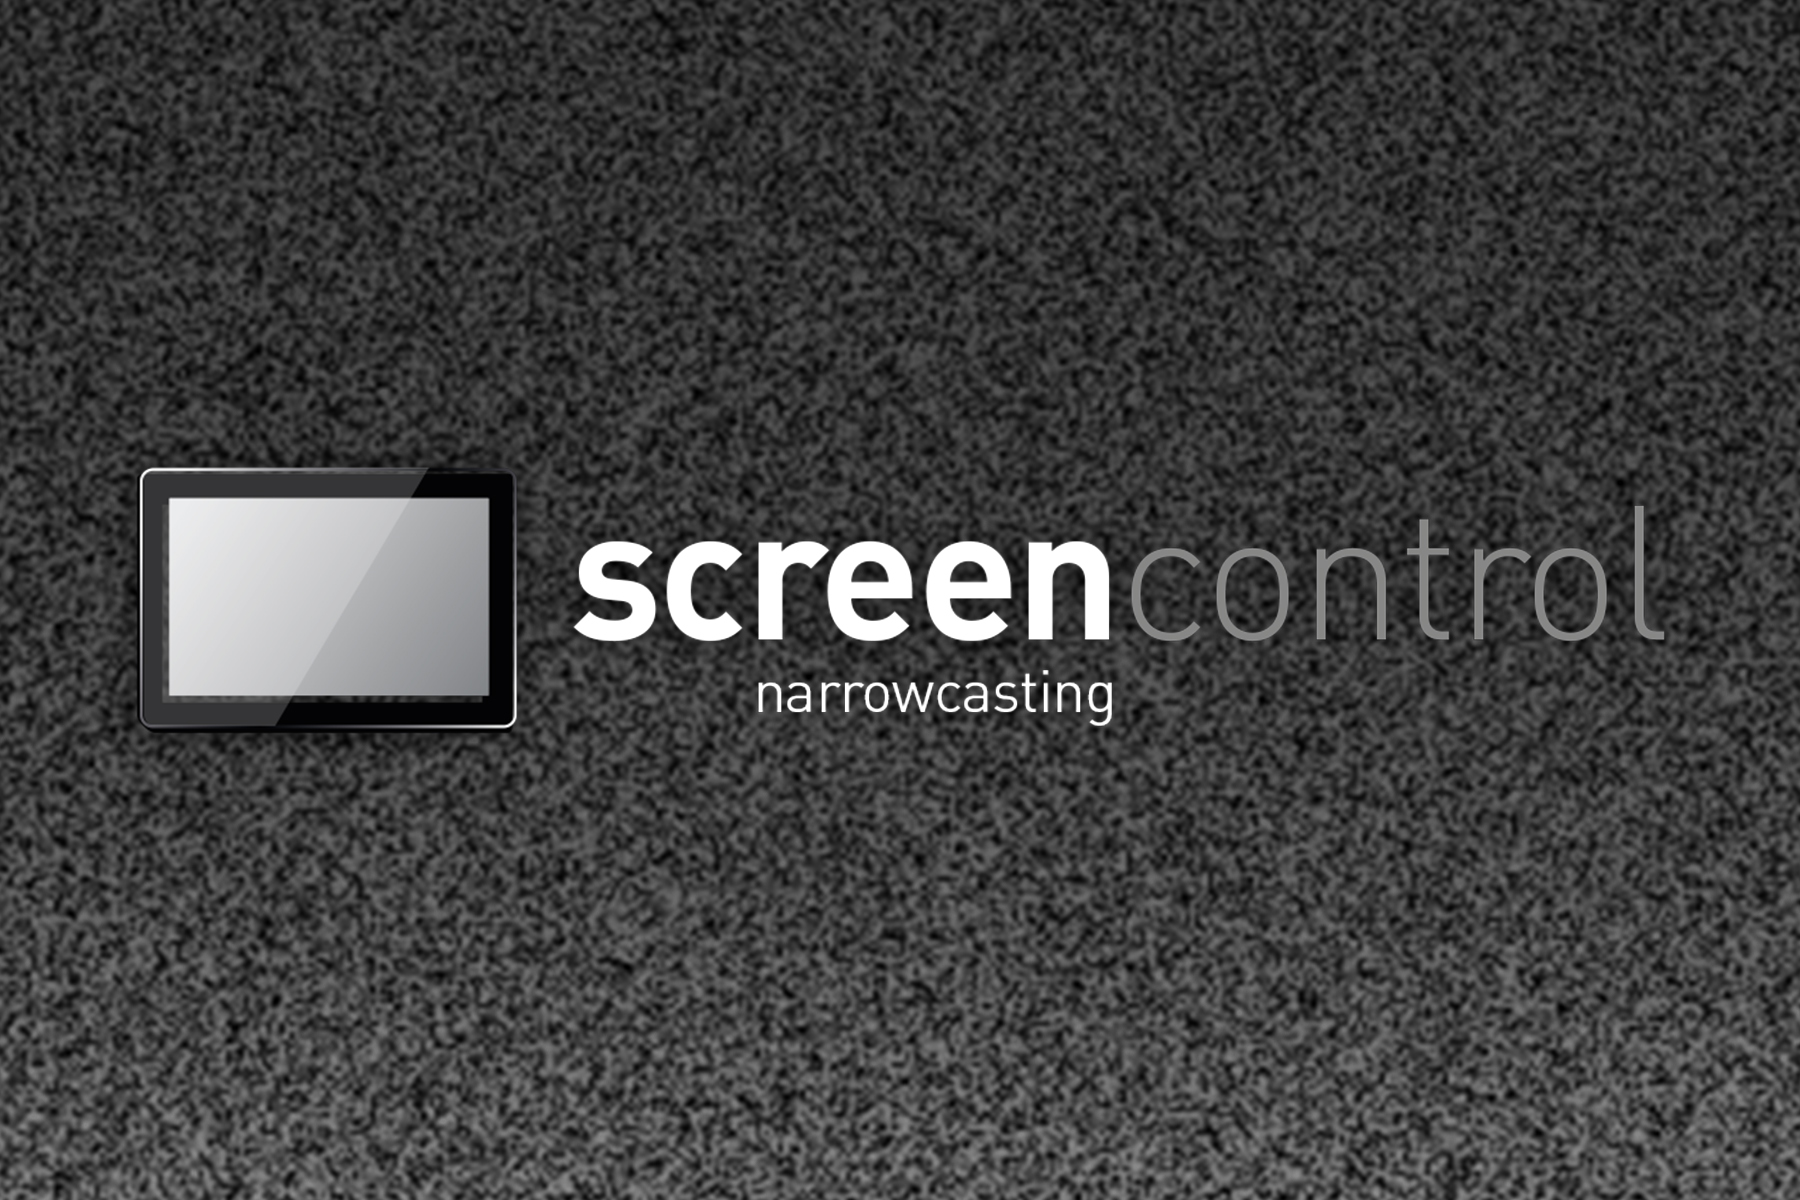 screencontrol